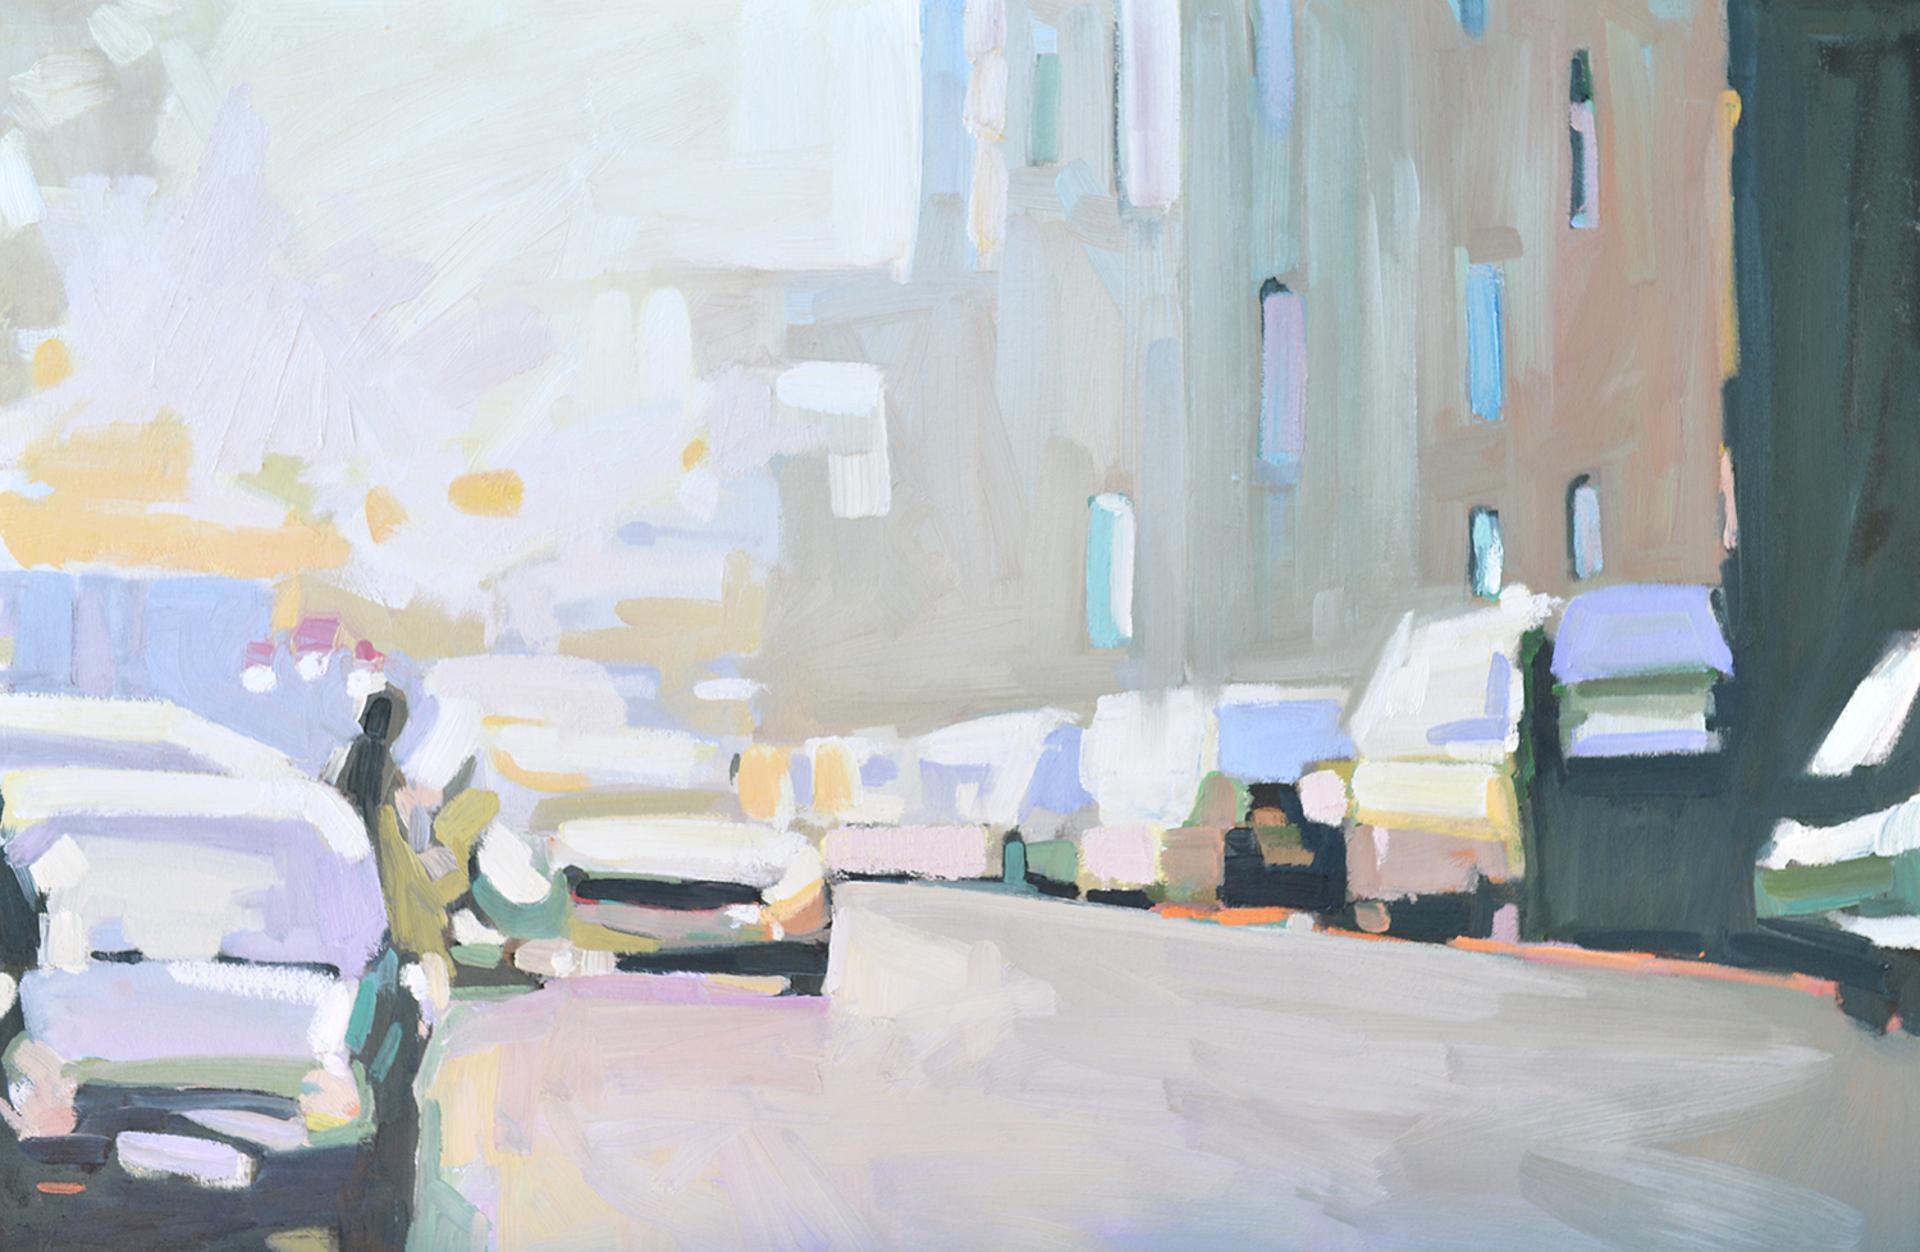 city street by Krista Townsend